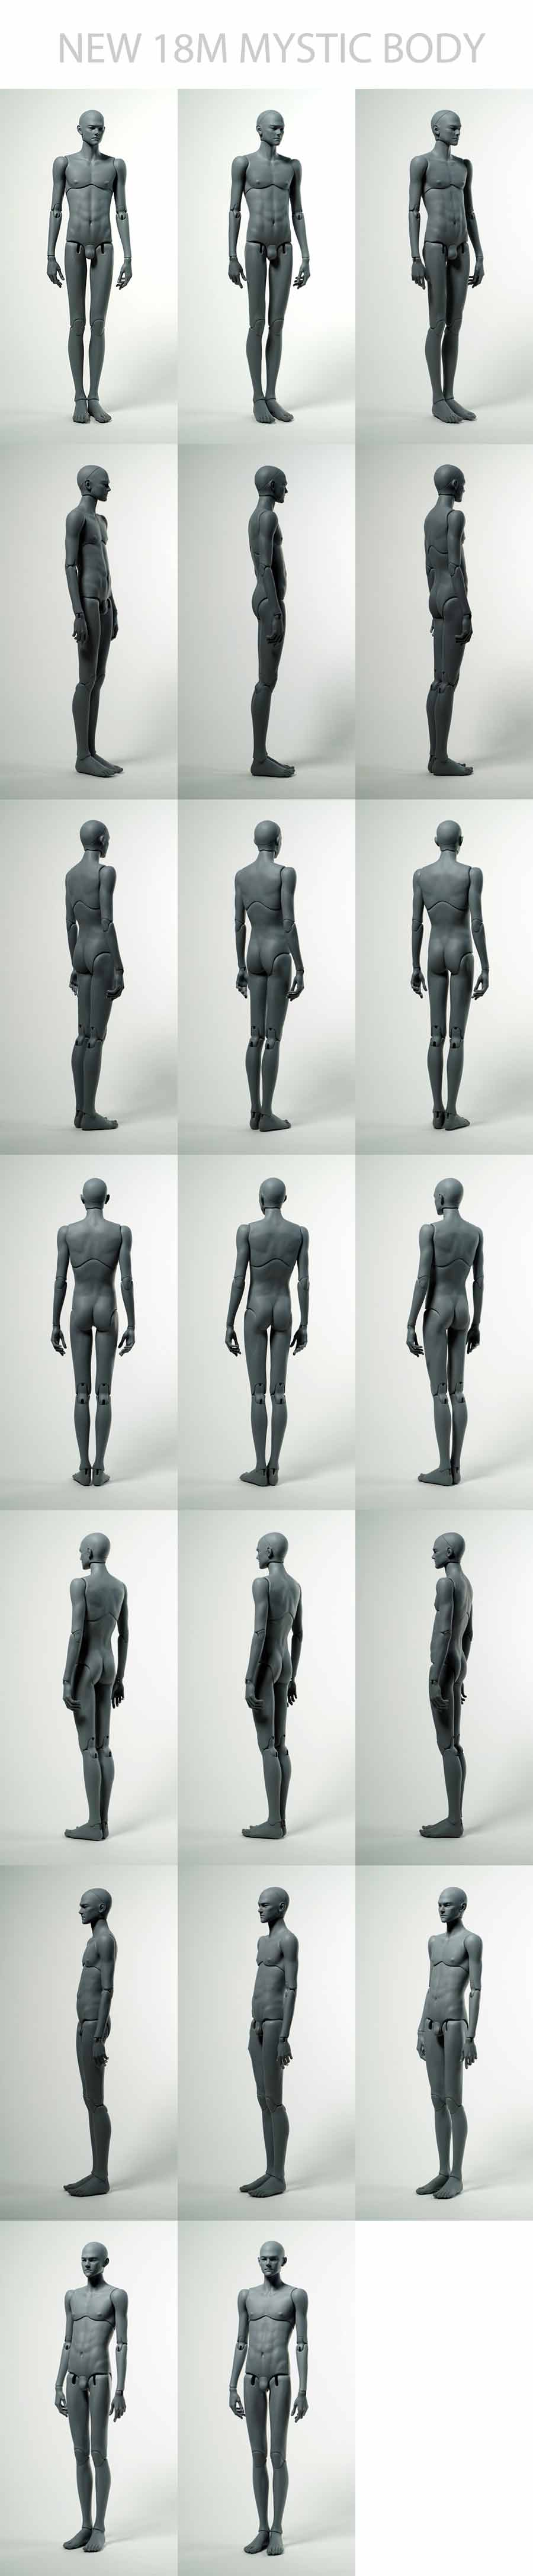 new-18m-mystic-body_01